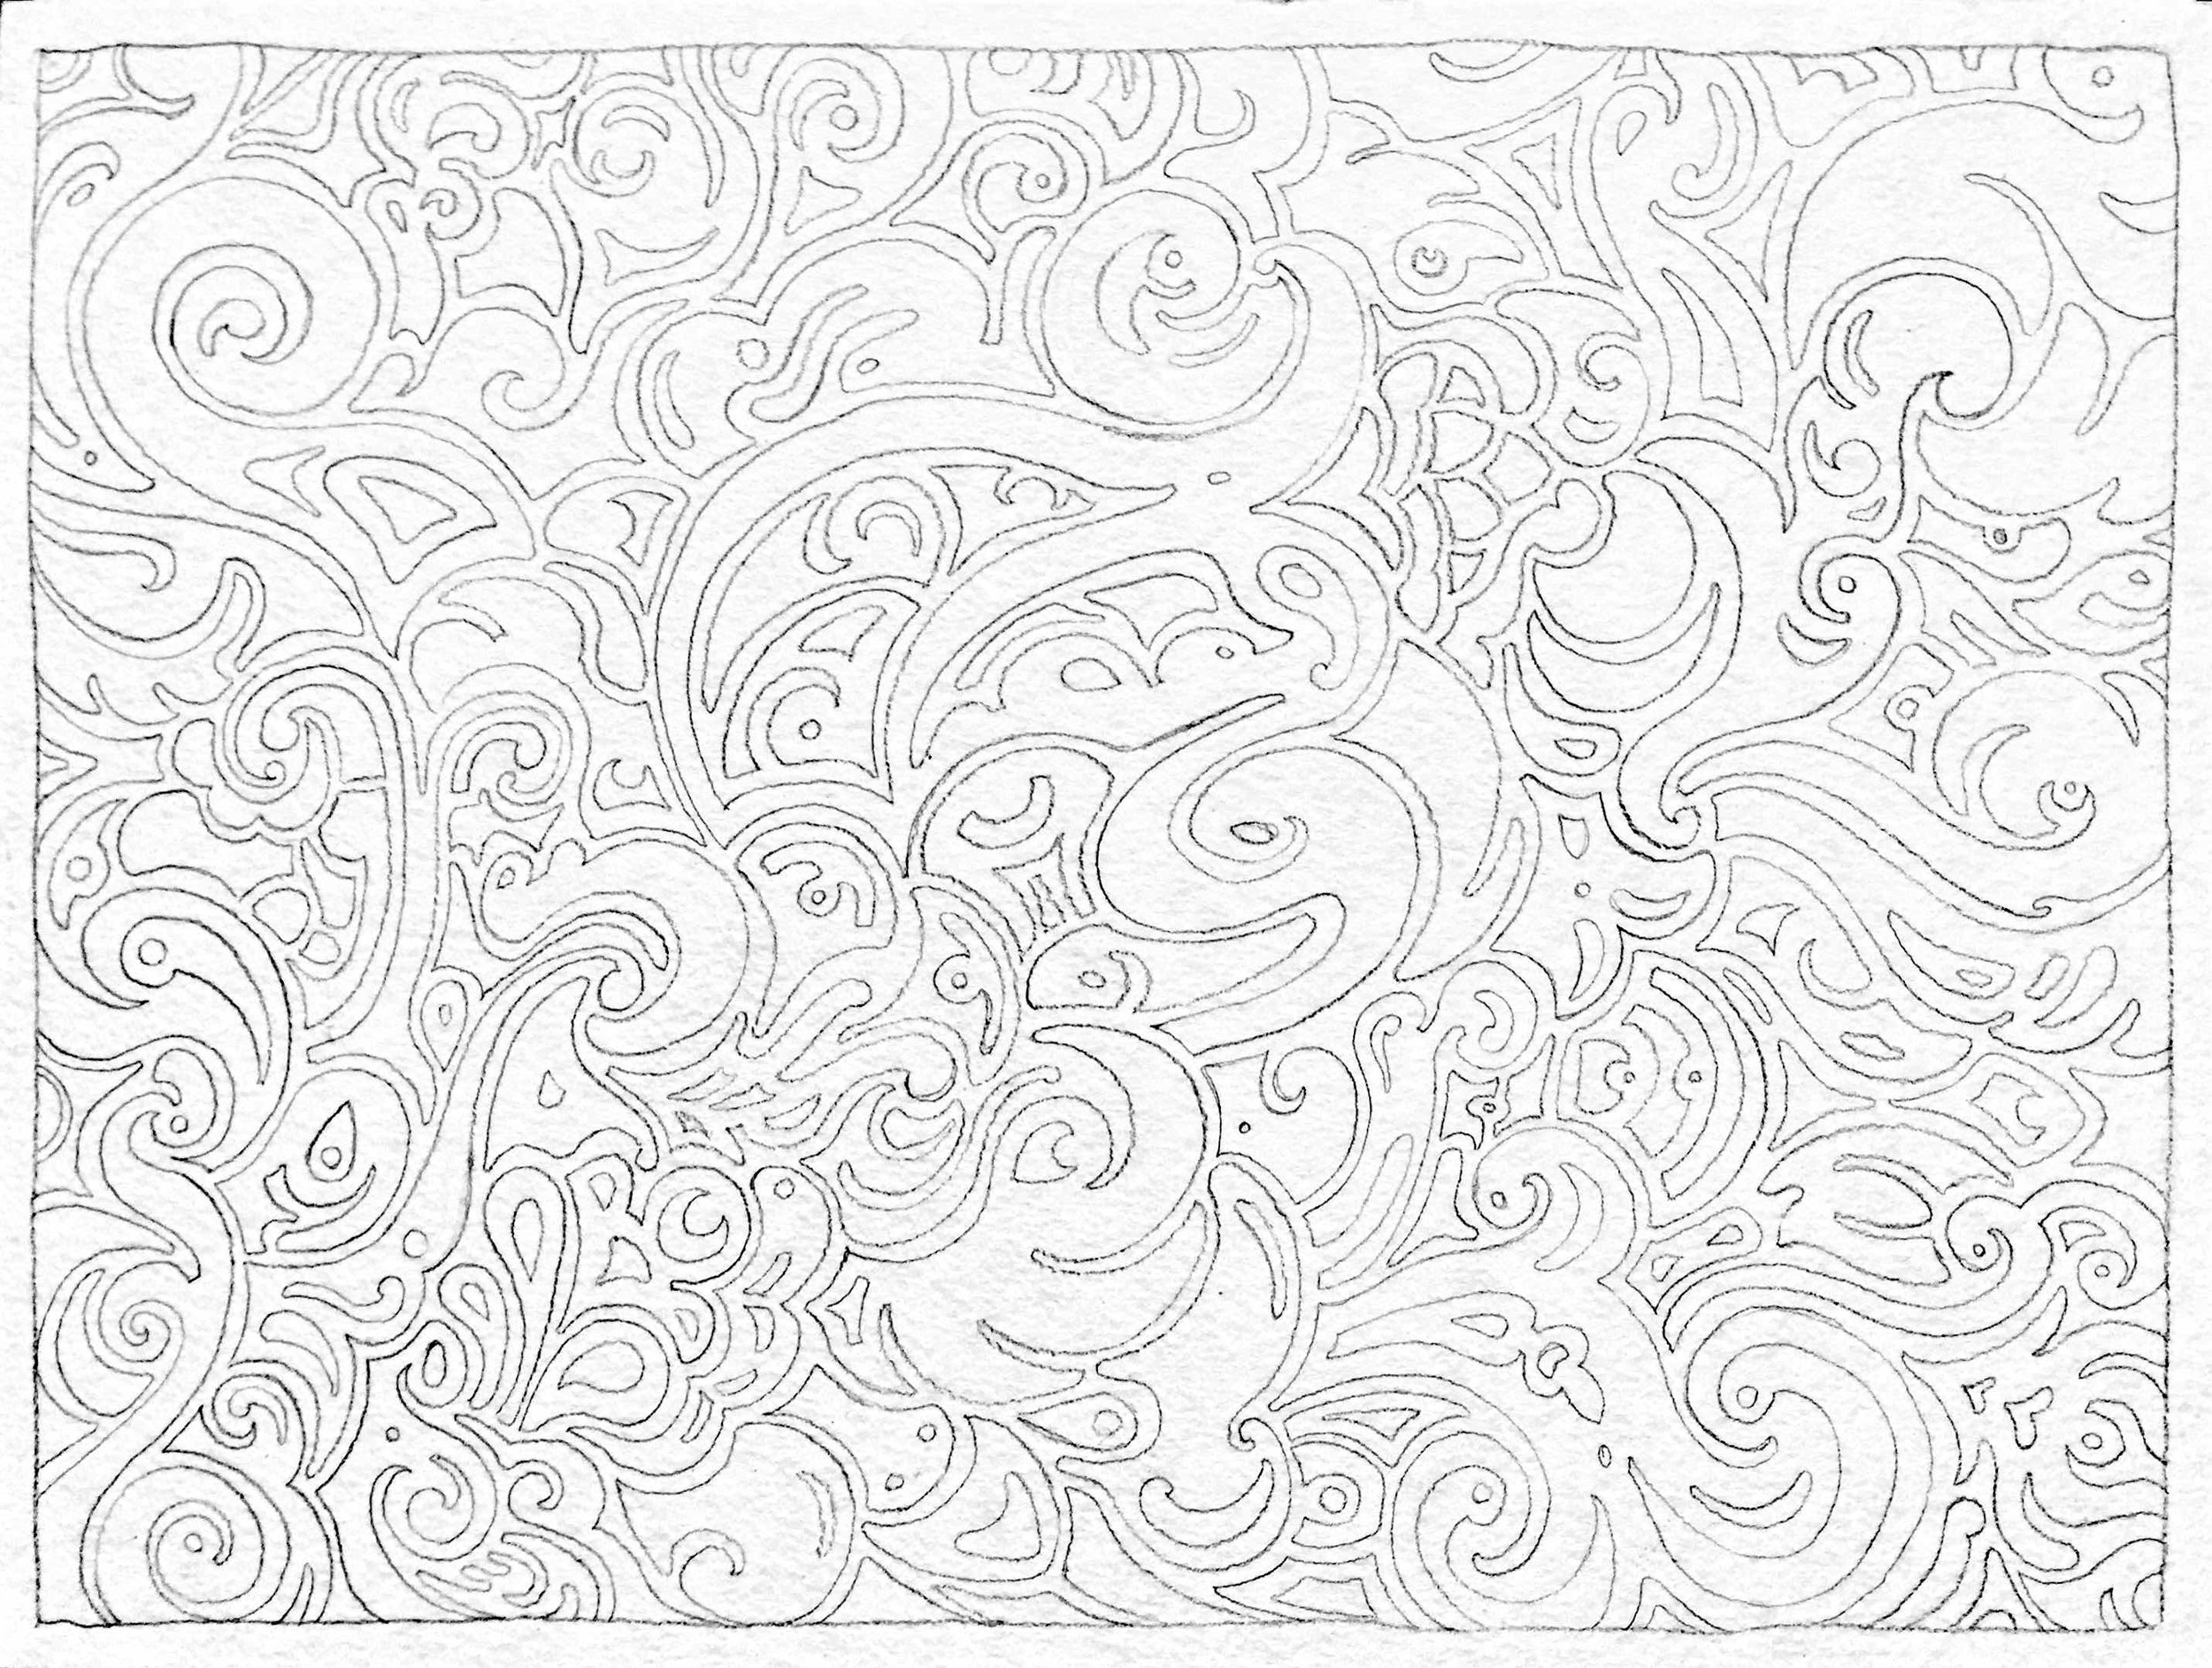 Doodle pattern drawing.jpg